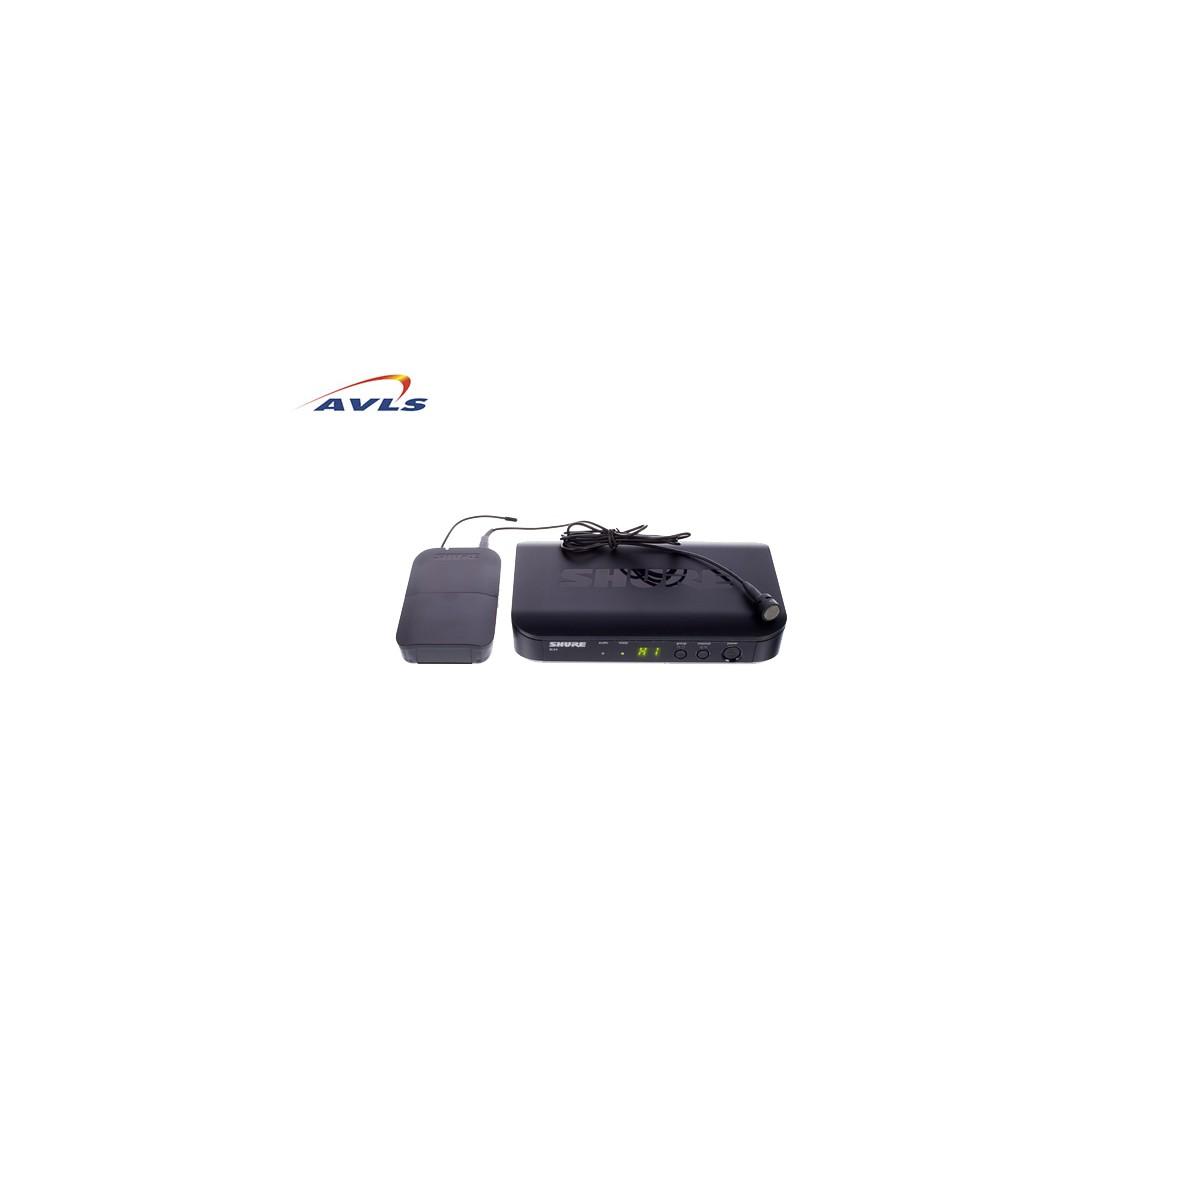 Location micro cravate sans fil CVL